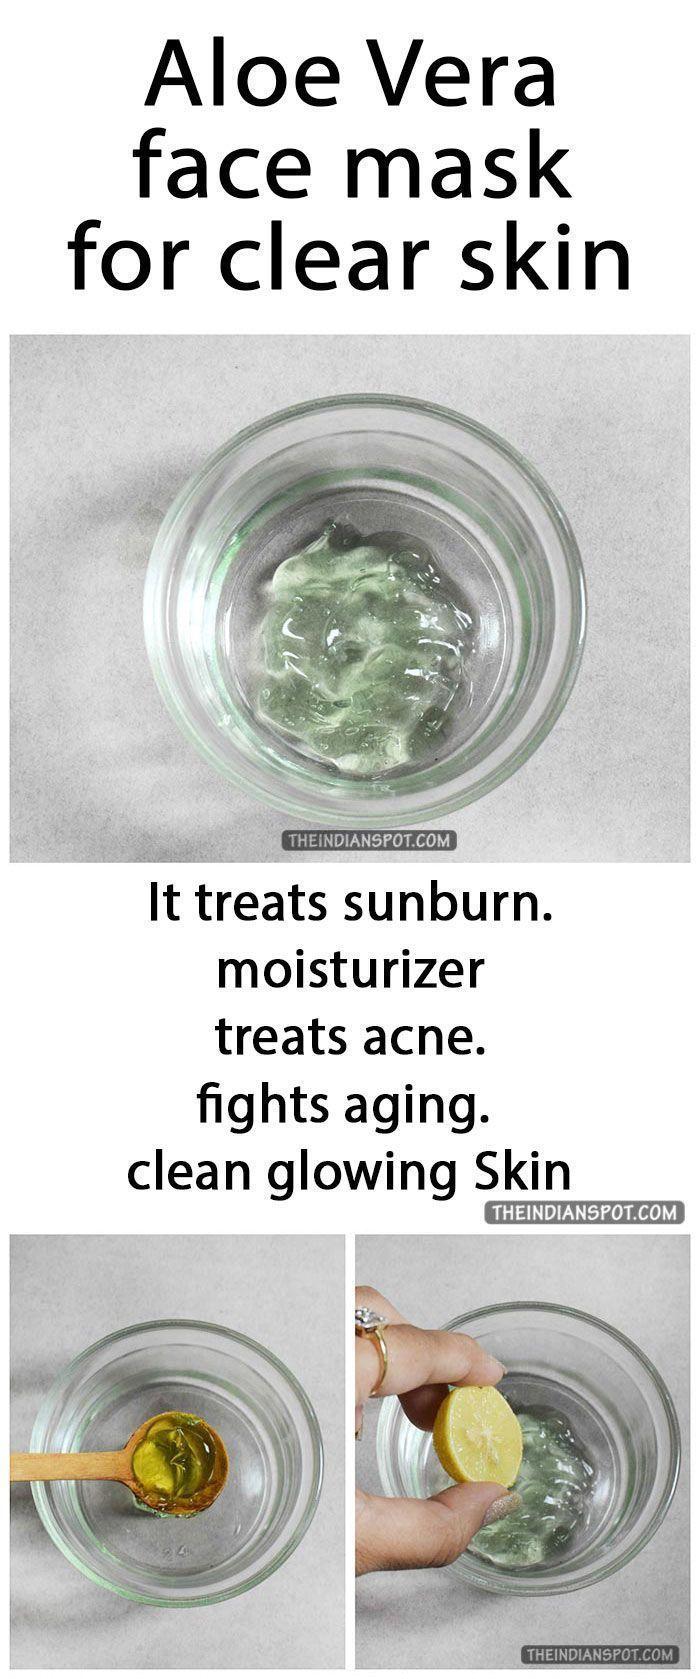 Aloe vera face mask for clear skin